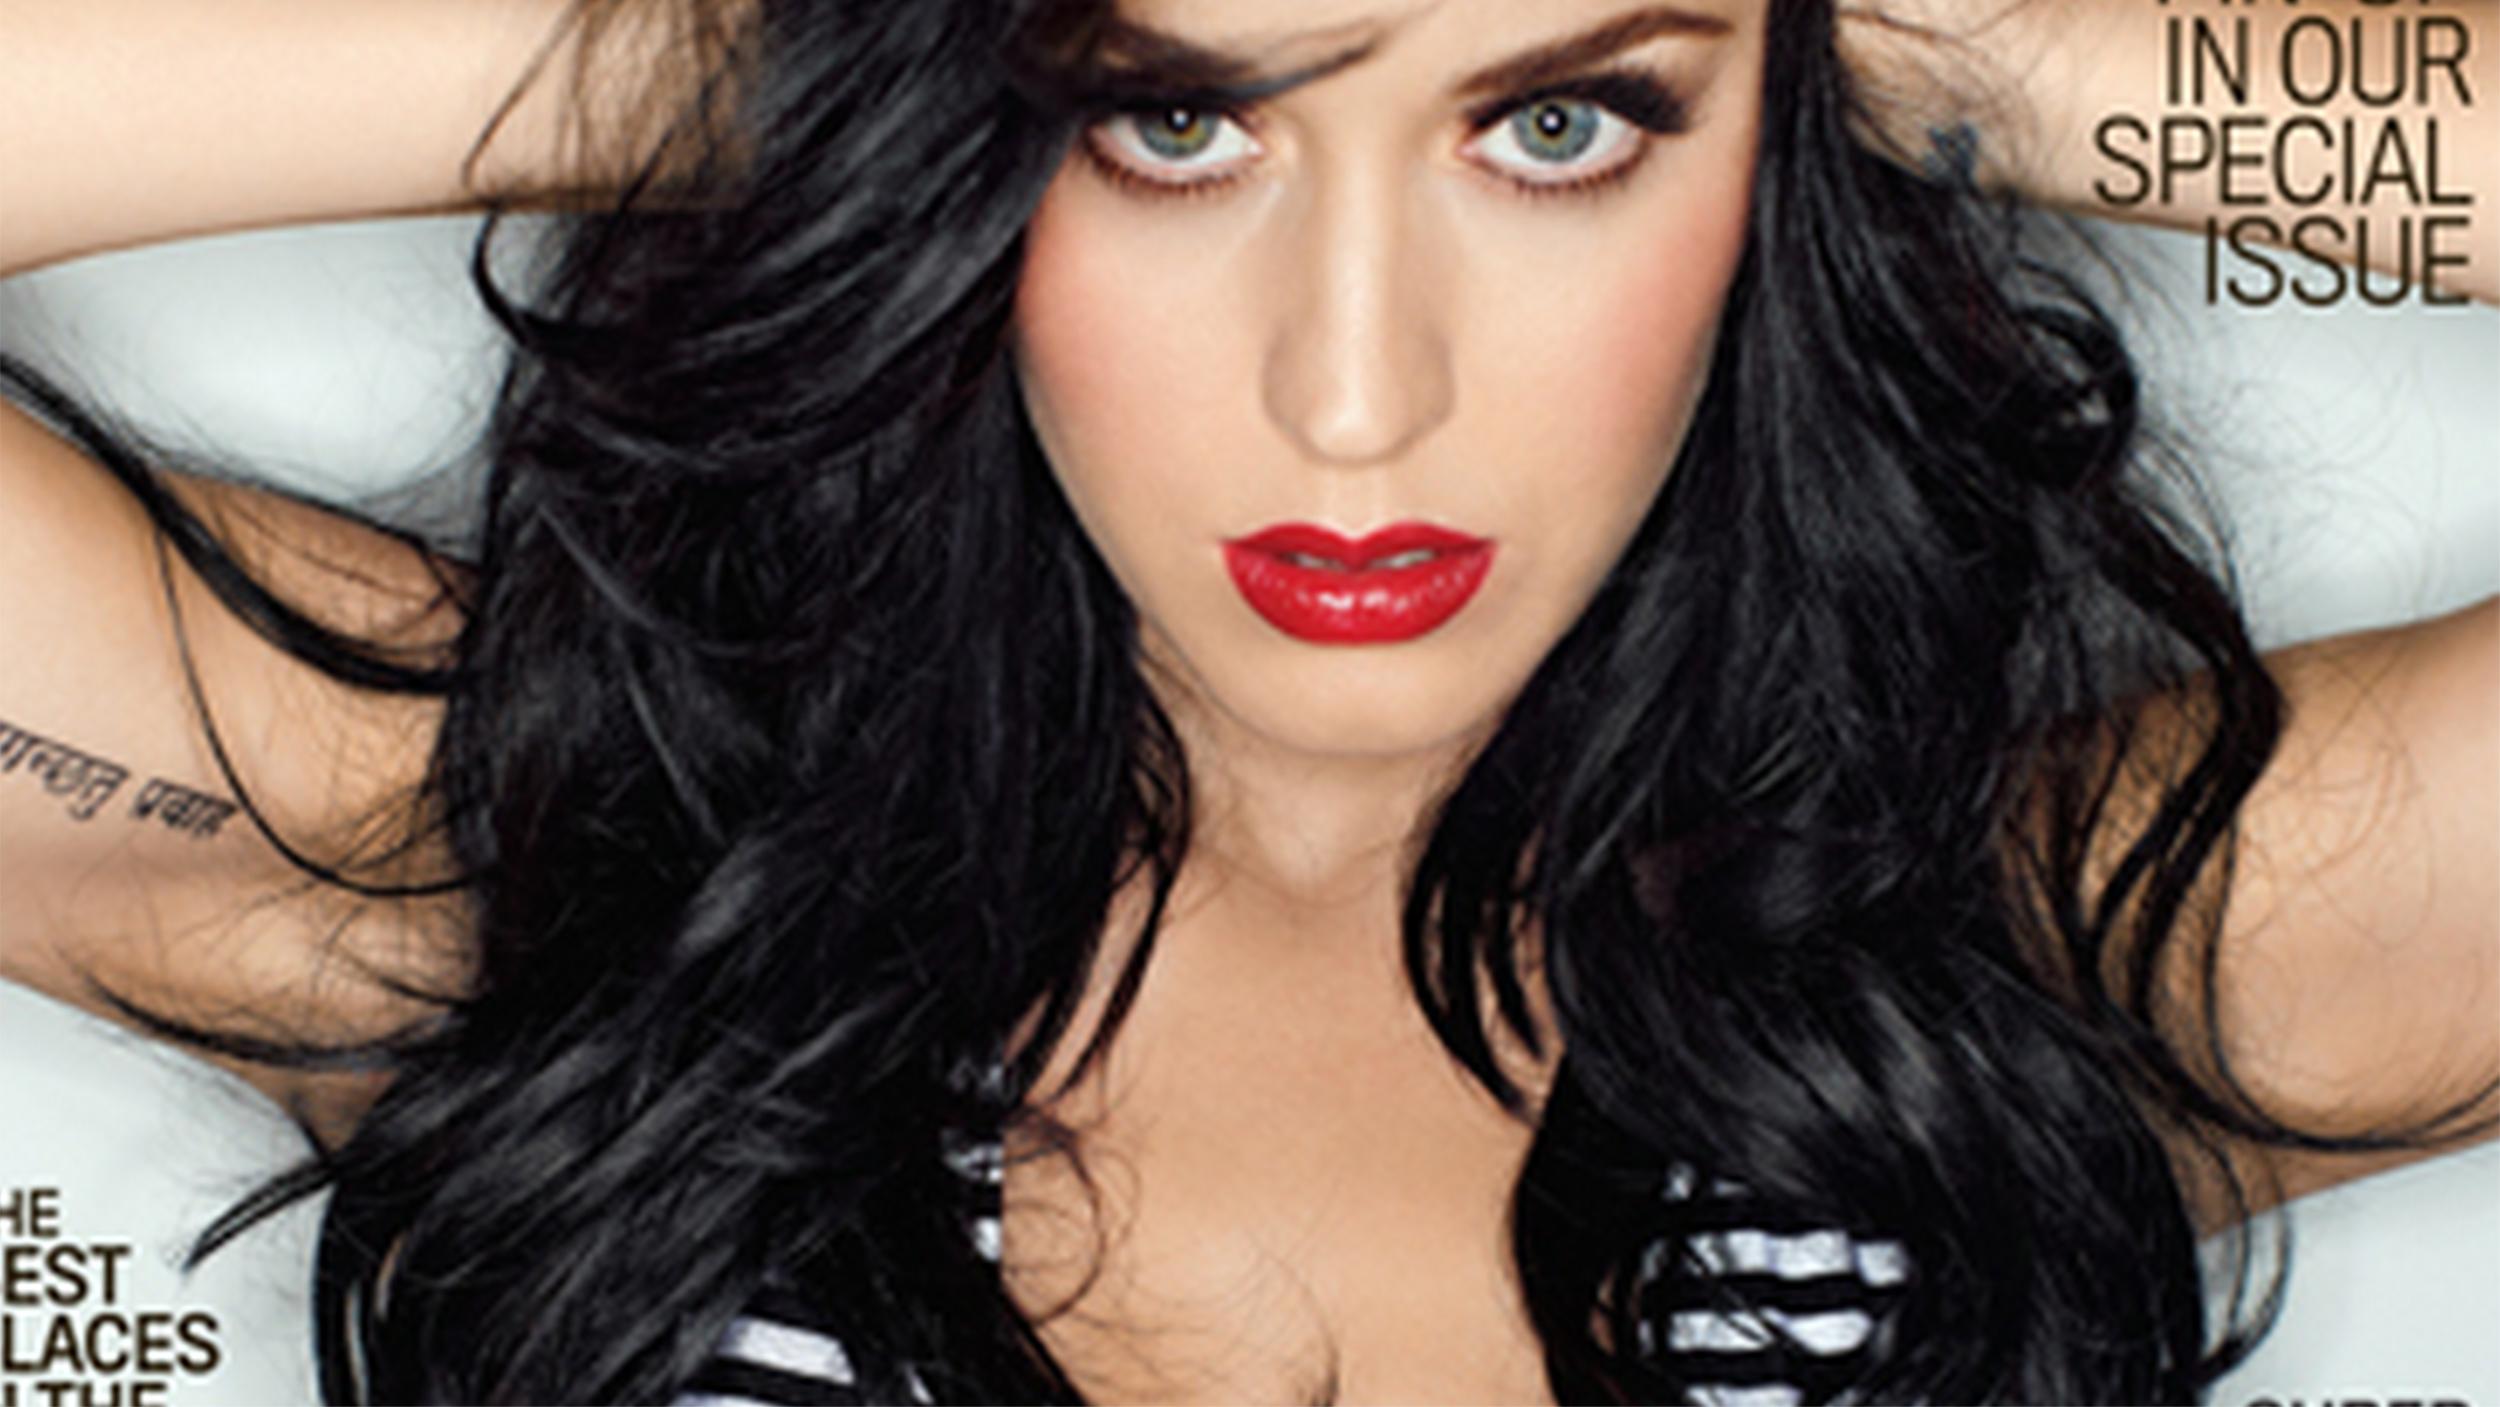 Katy Perry: Katy Perry Talks John Mayer, Aliens, Geisha Outfit